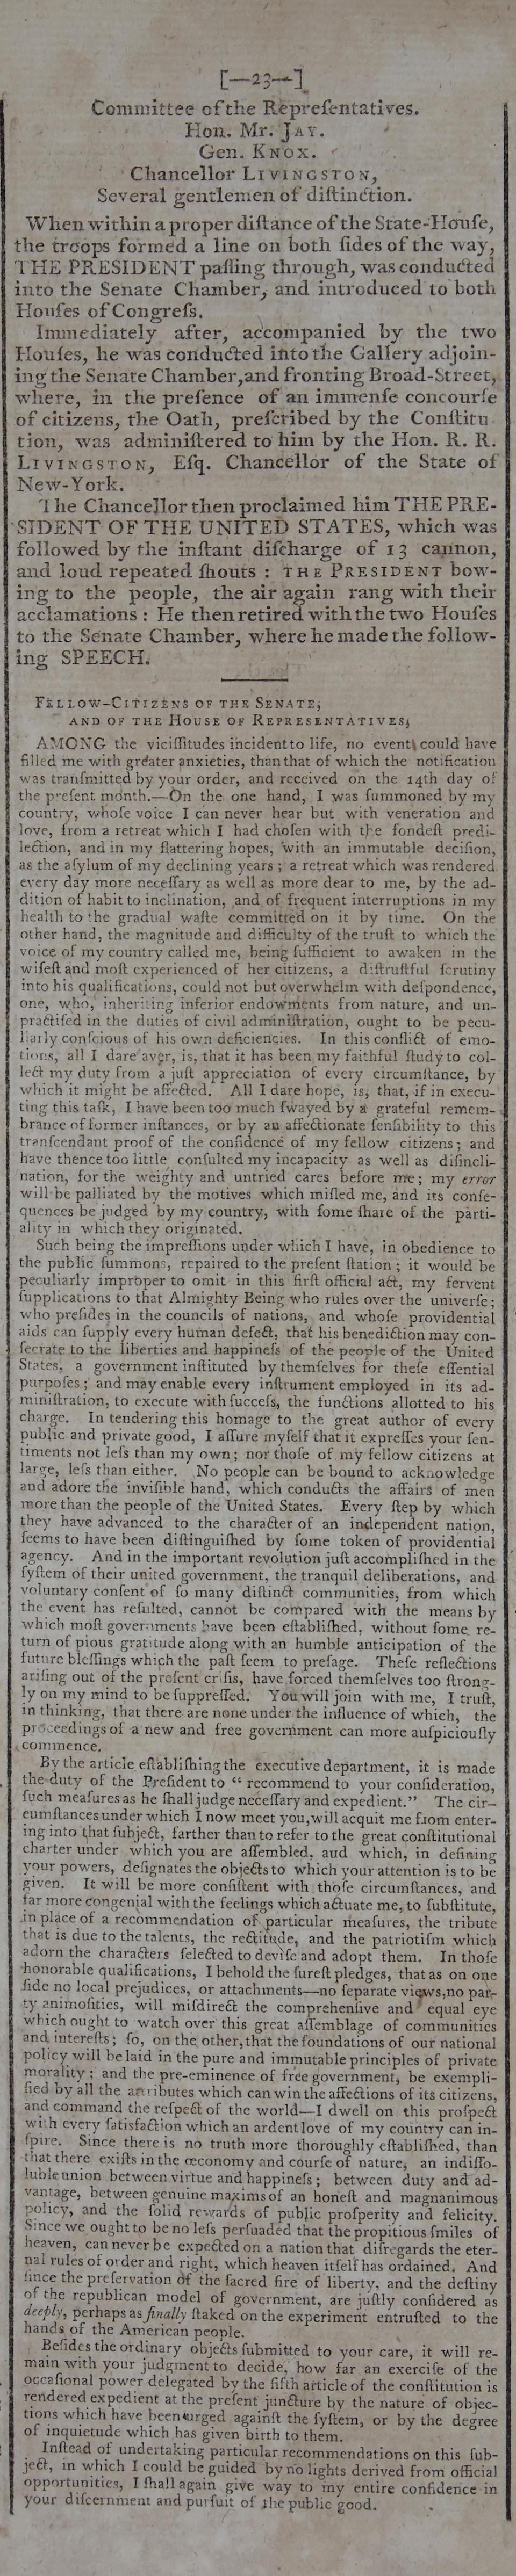 WASHINGTON'S FIRST INAUGURAL ADDRESS. Gazette of the United States, No. 6. New York: John Fenno, May 2, 1789.